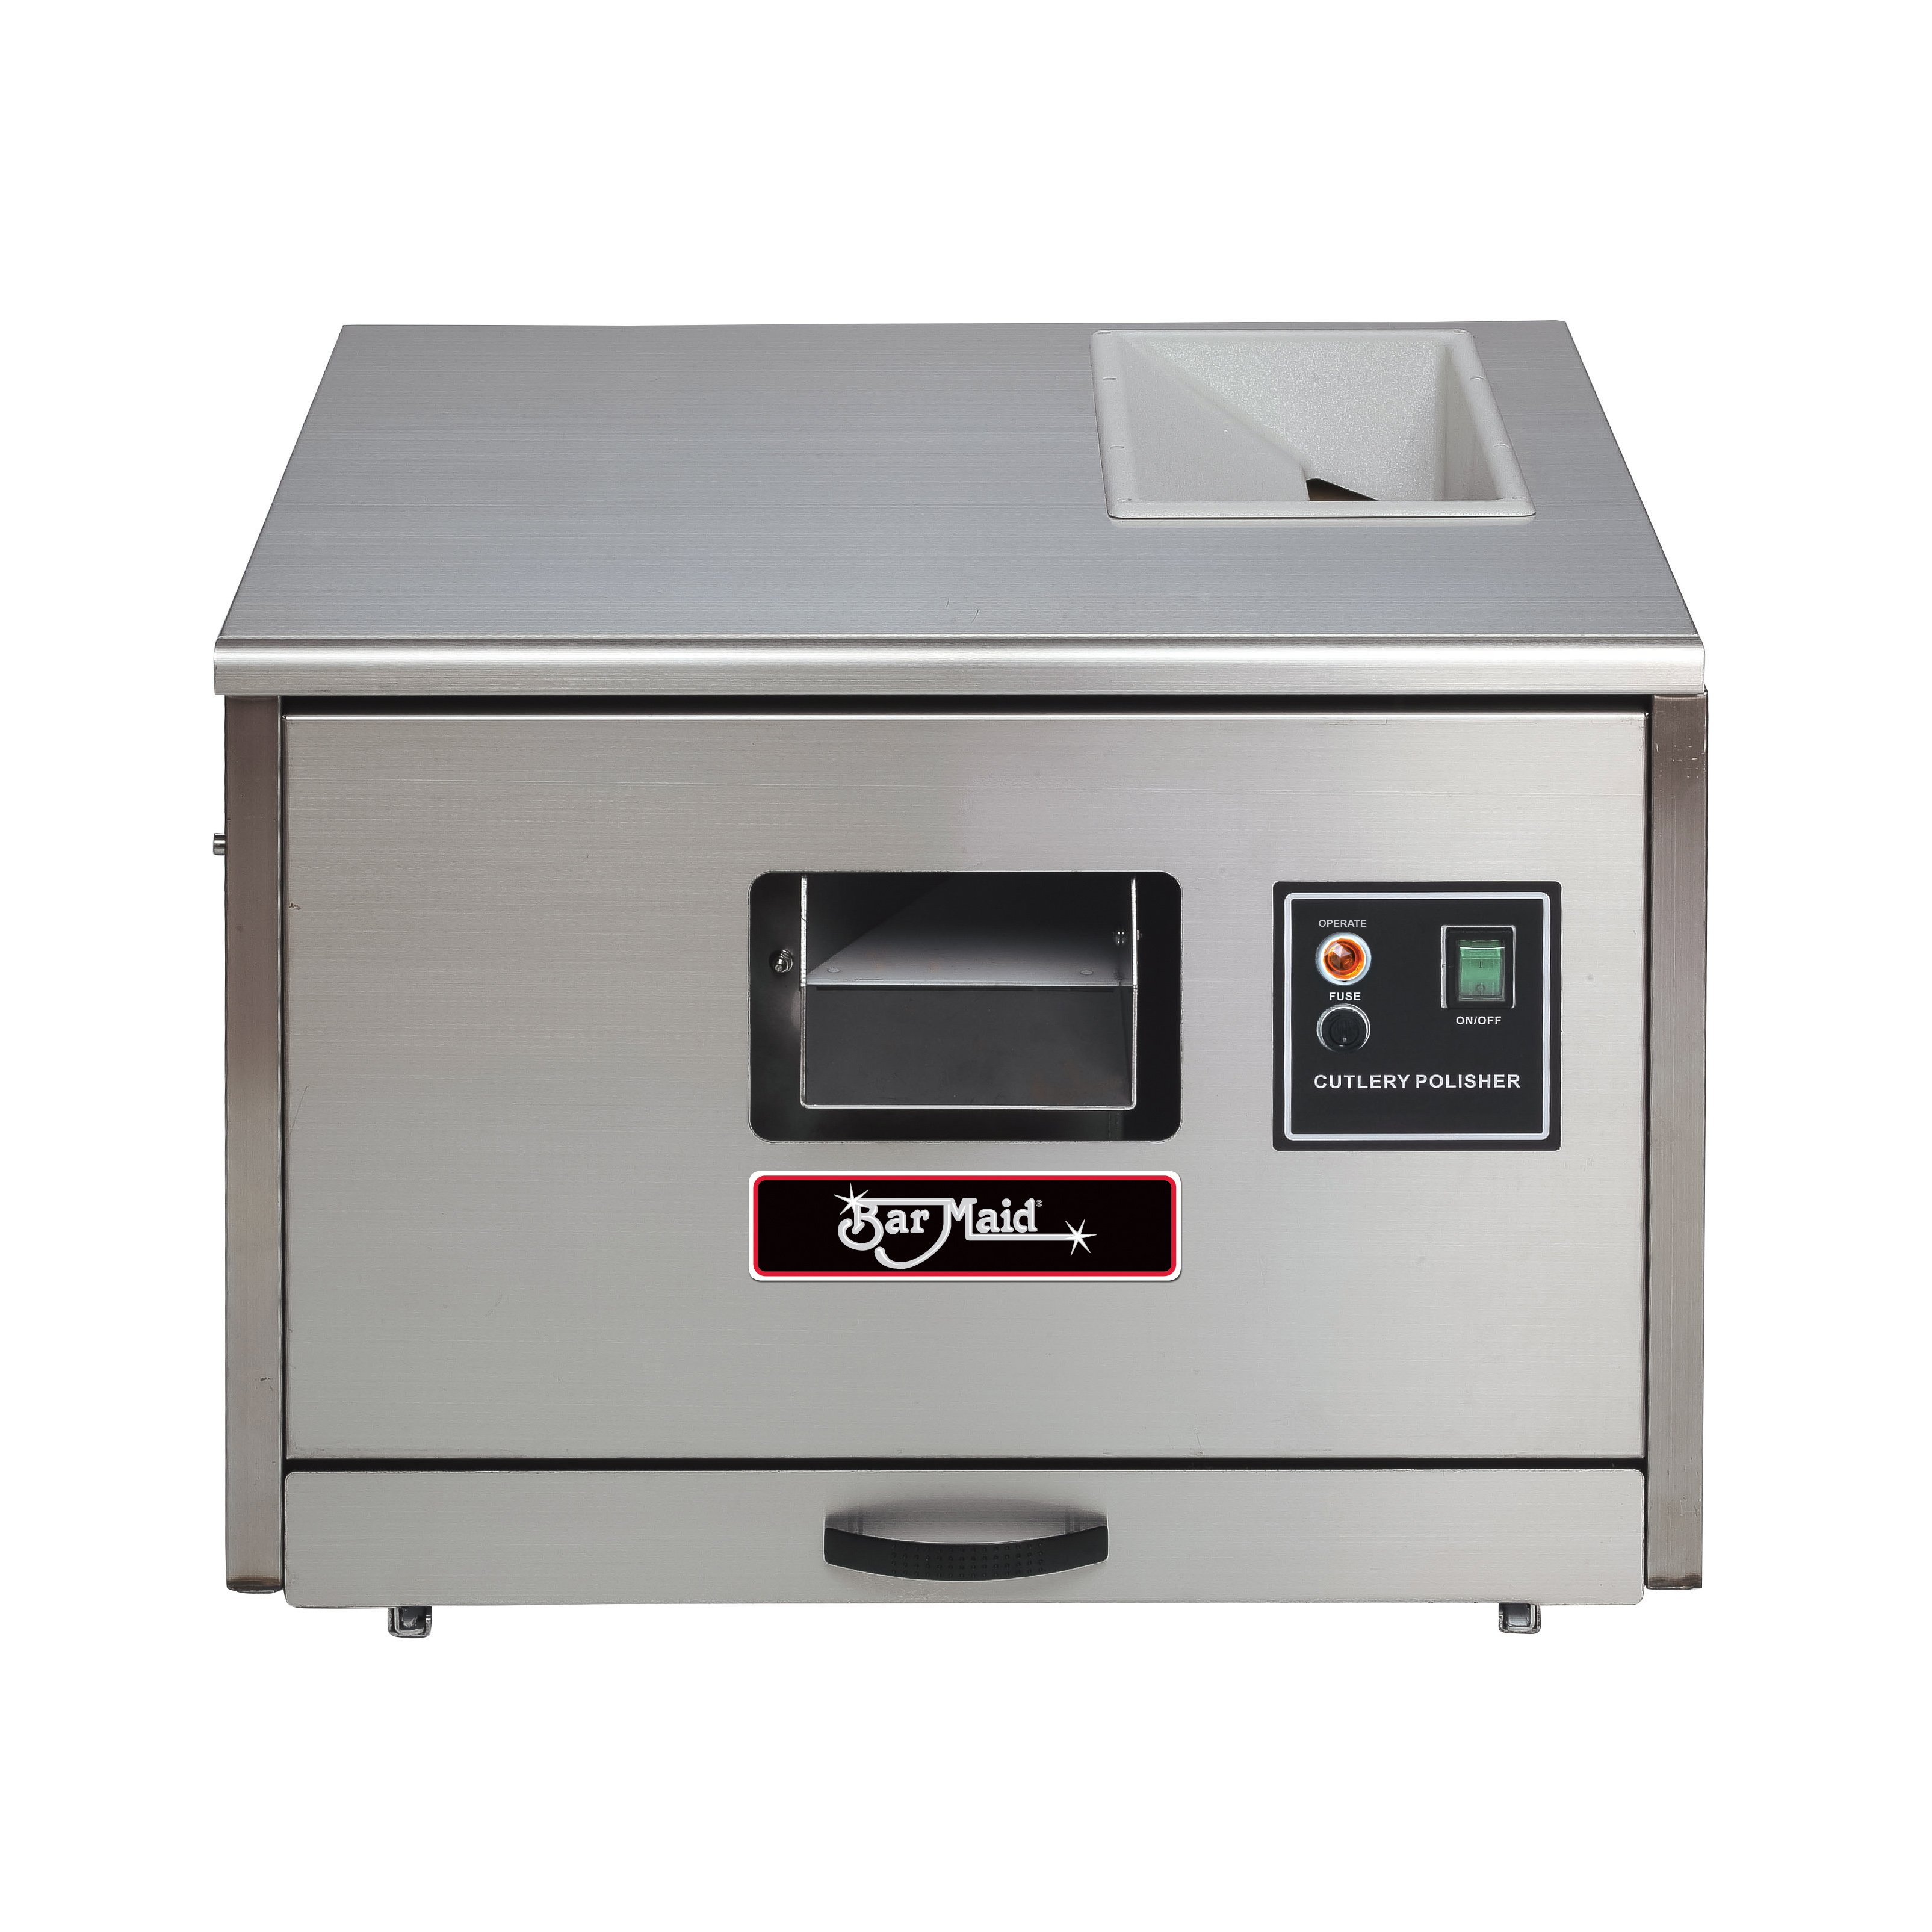 Bar Maid/Glass Pro CP-7000 cutlery dryer / polisher